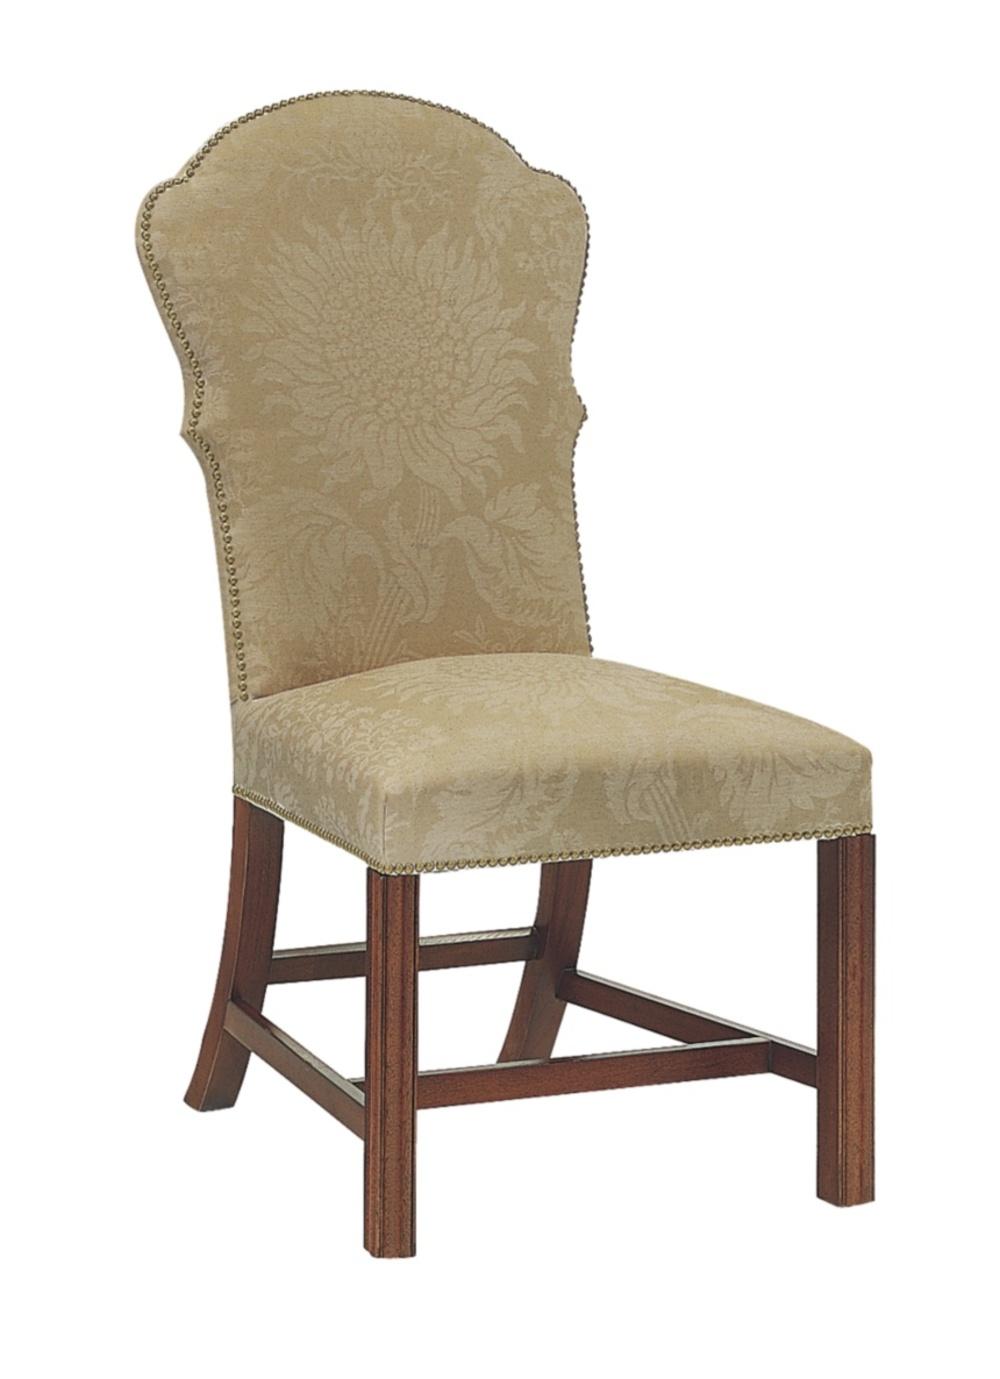 Hickory Chair - Marlboro Side Chair